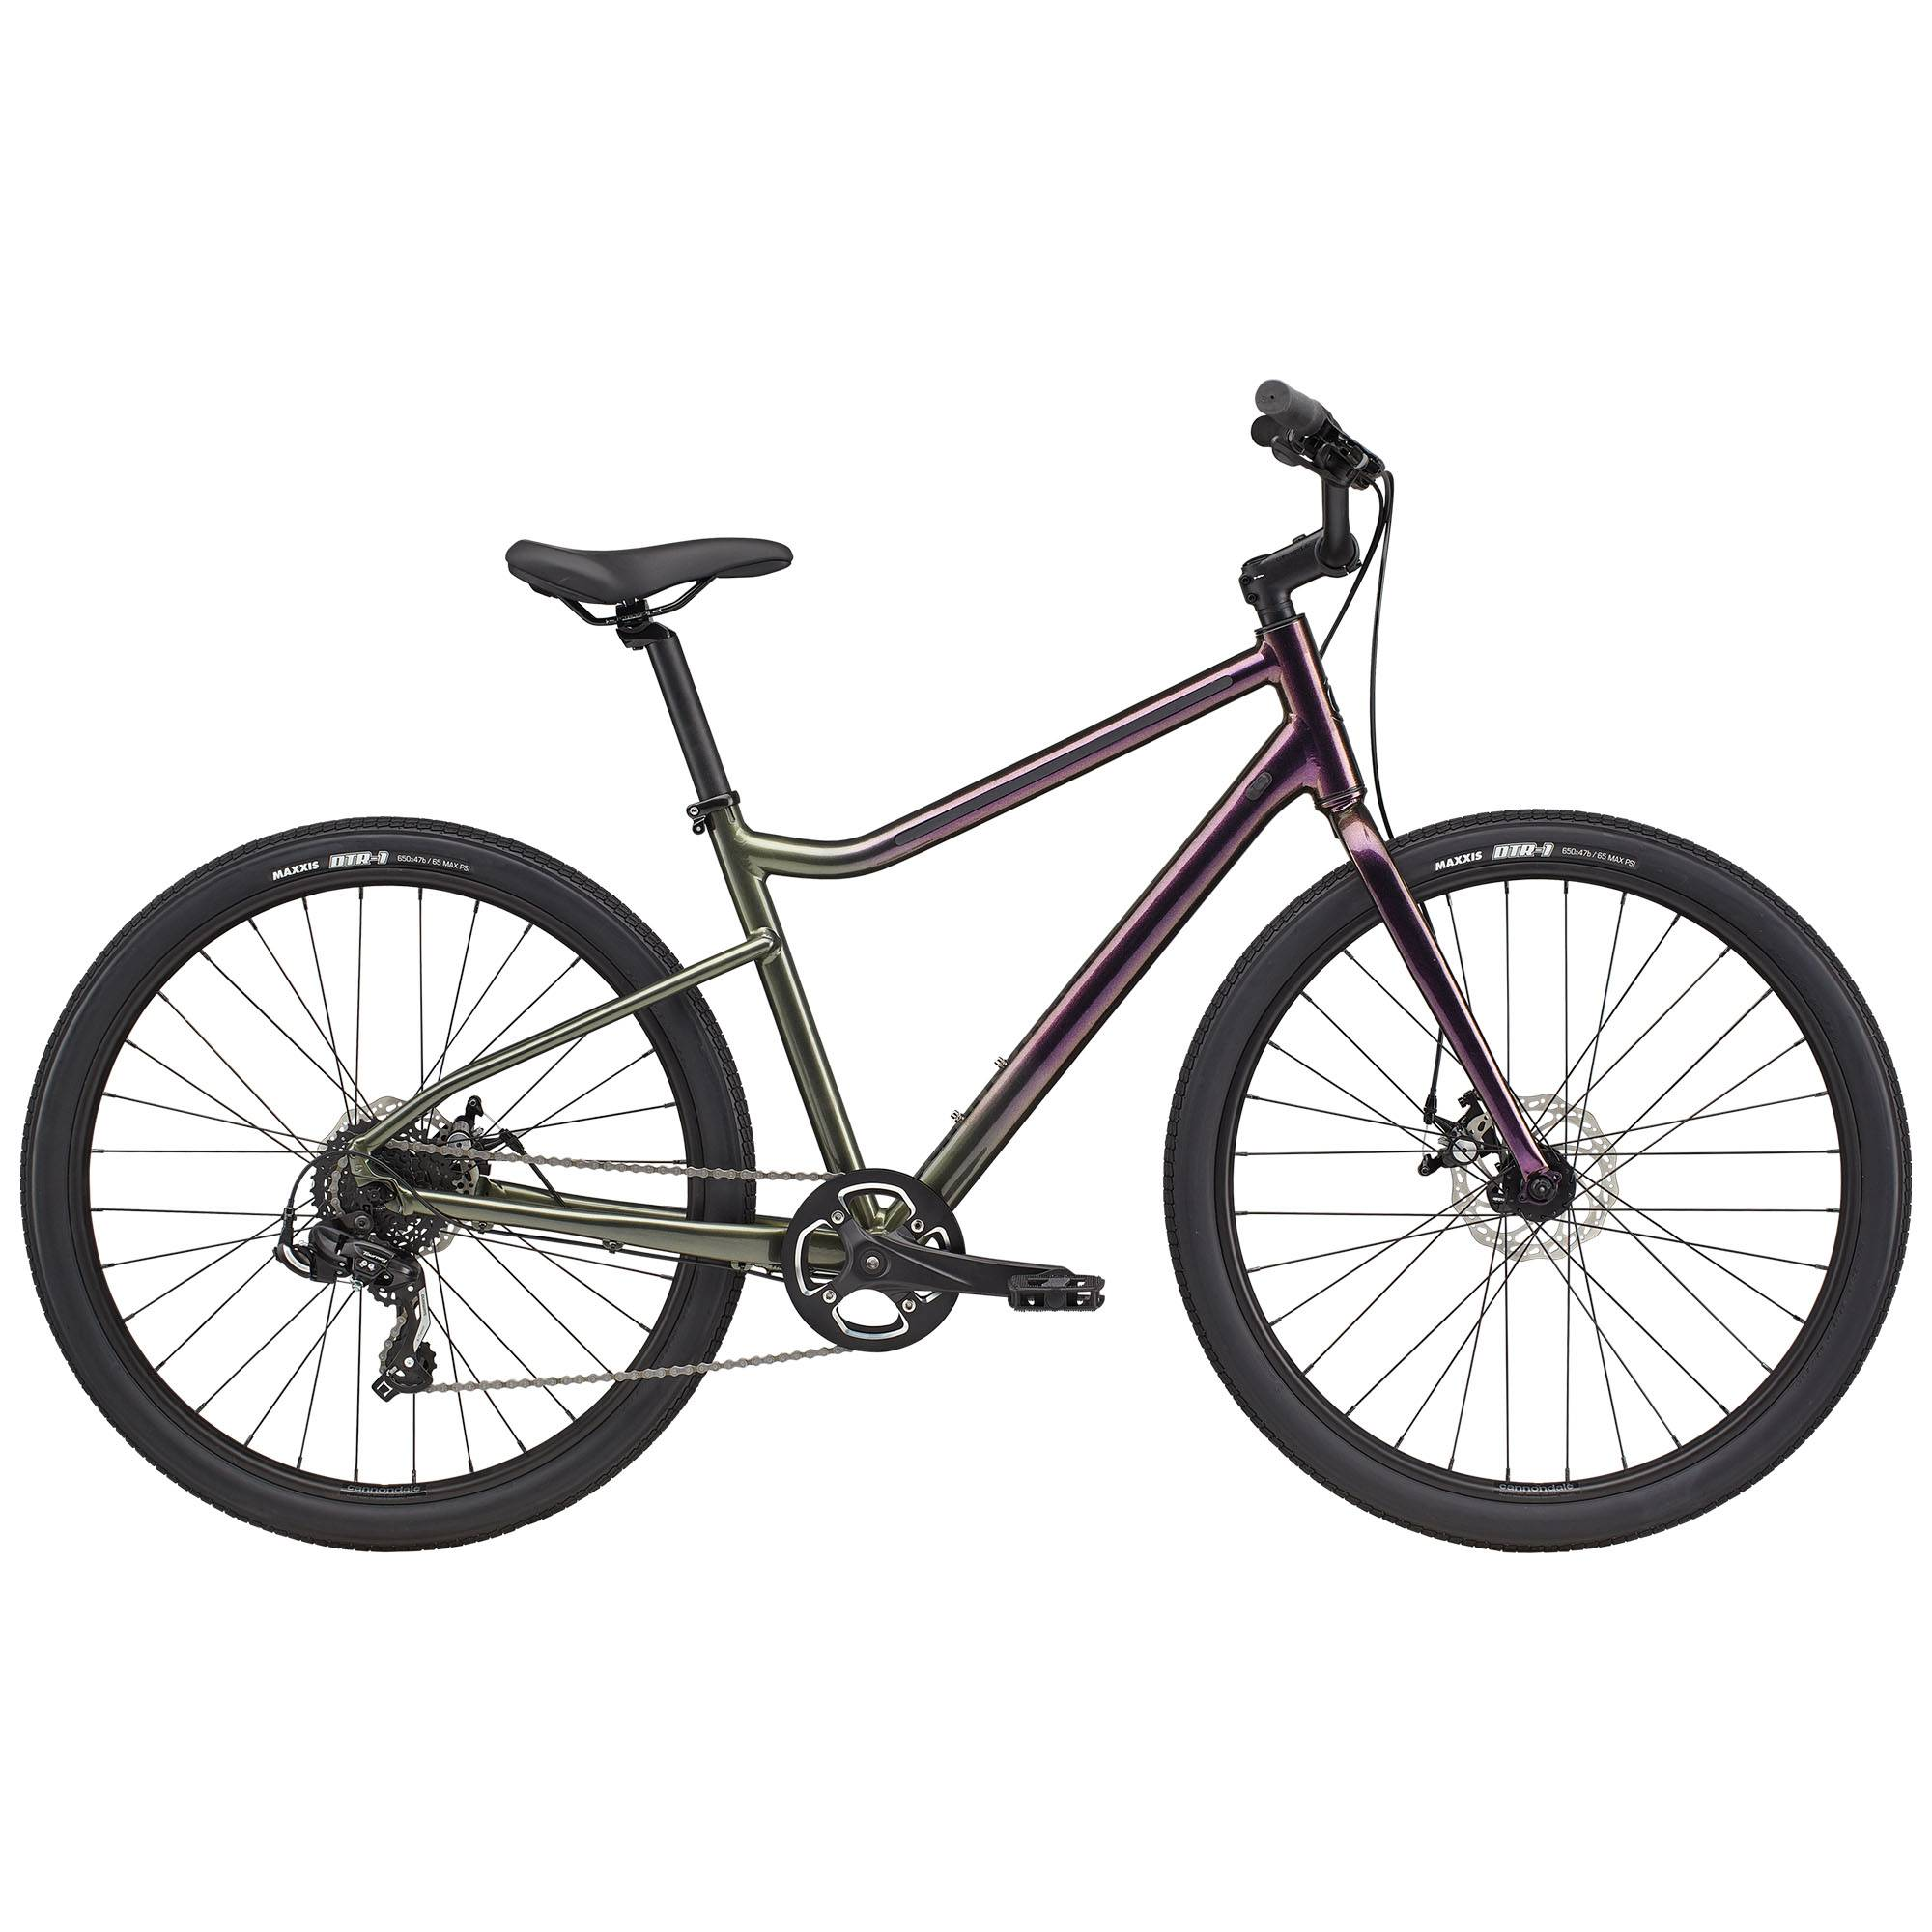 Cannondale Treadwell 3 LTD Urban Bike '21  - Highlighter - Size: Large